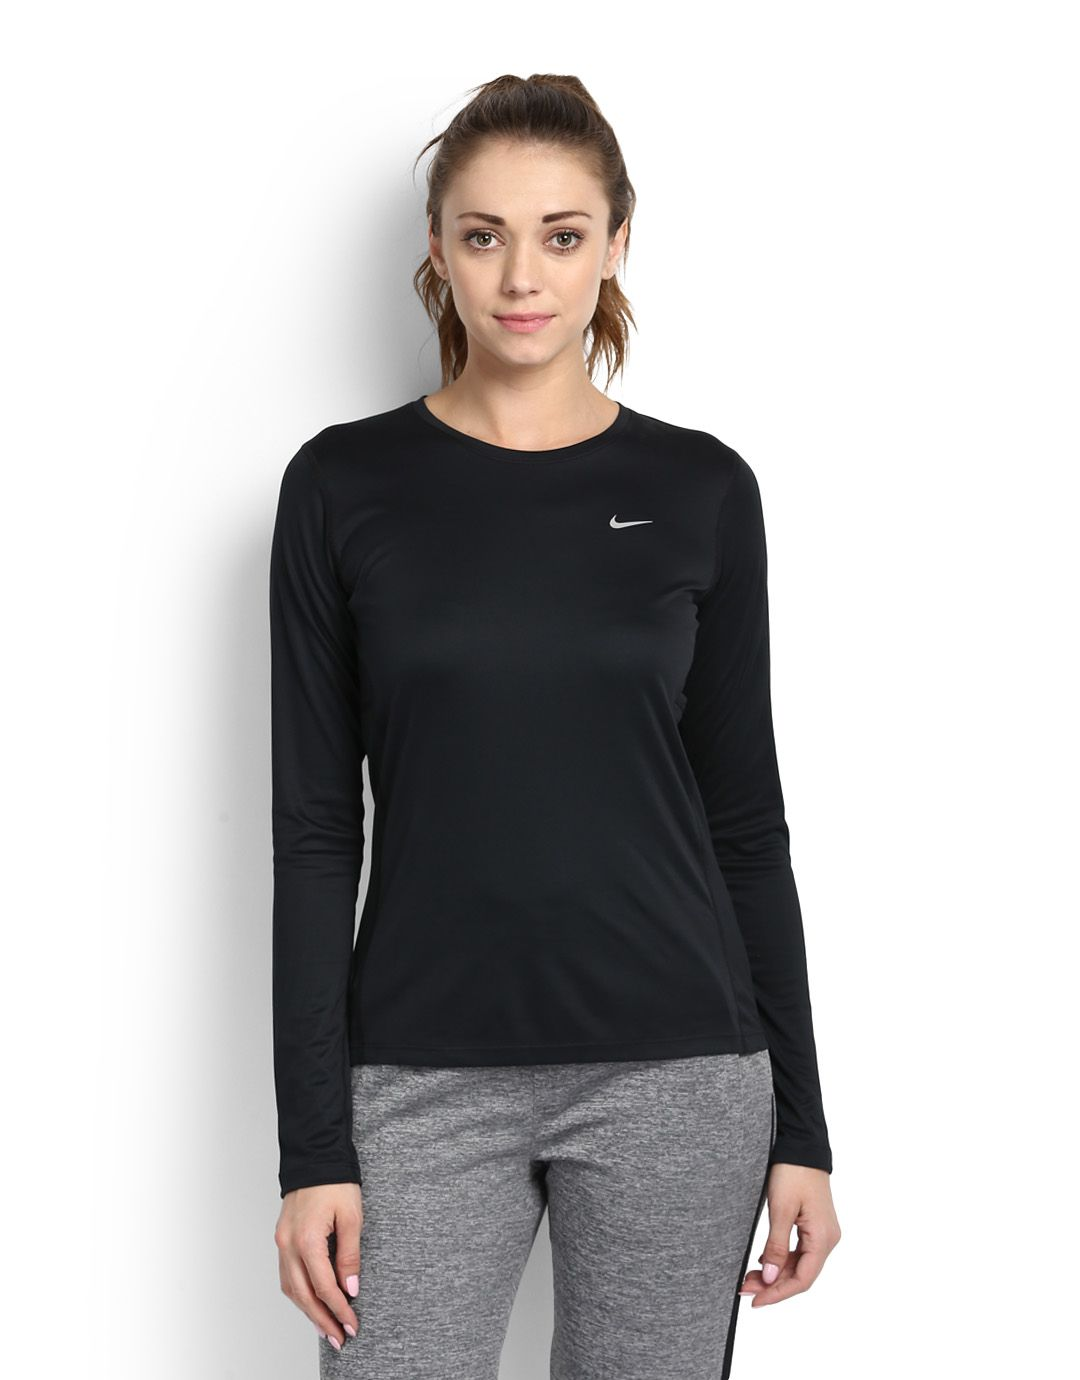 Nike Black T-Shirt